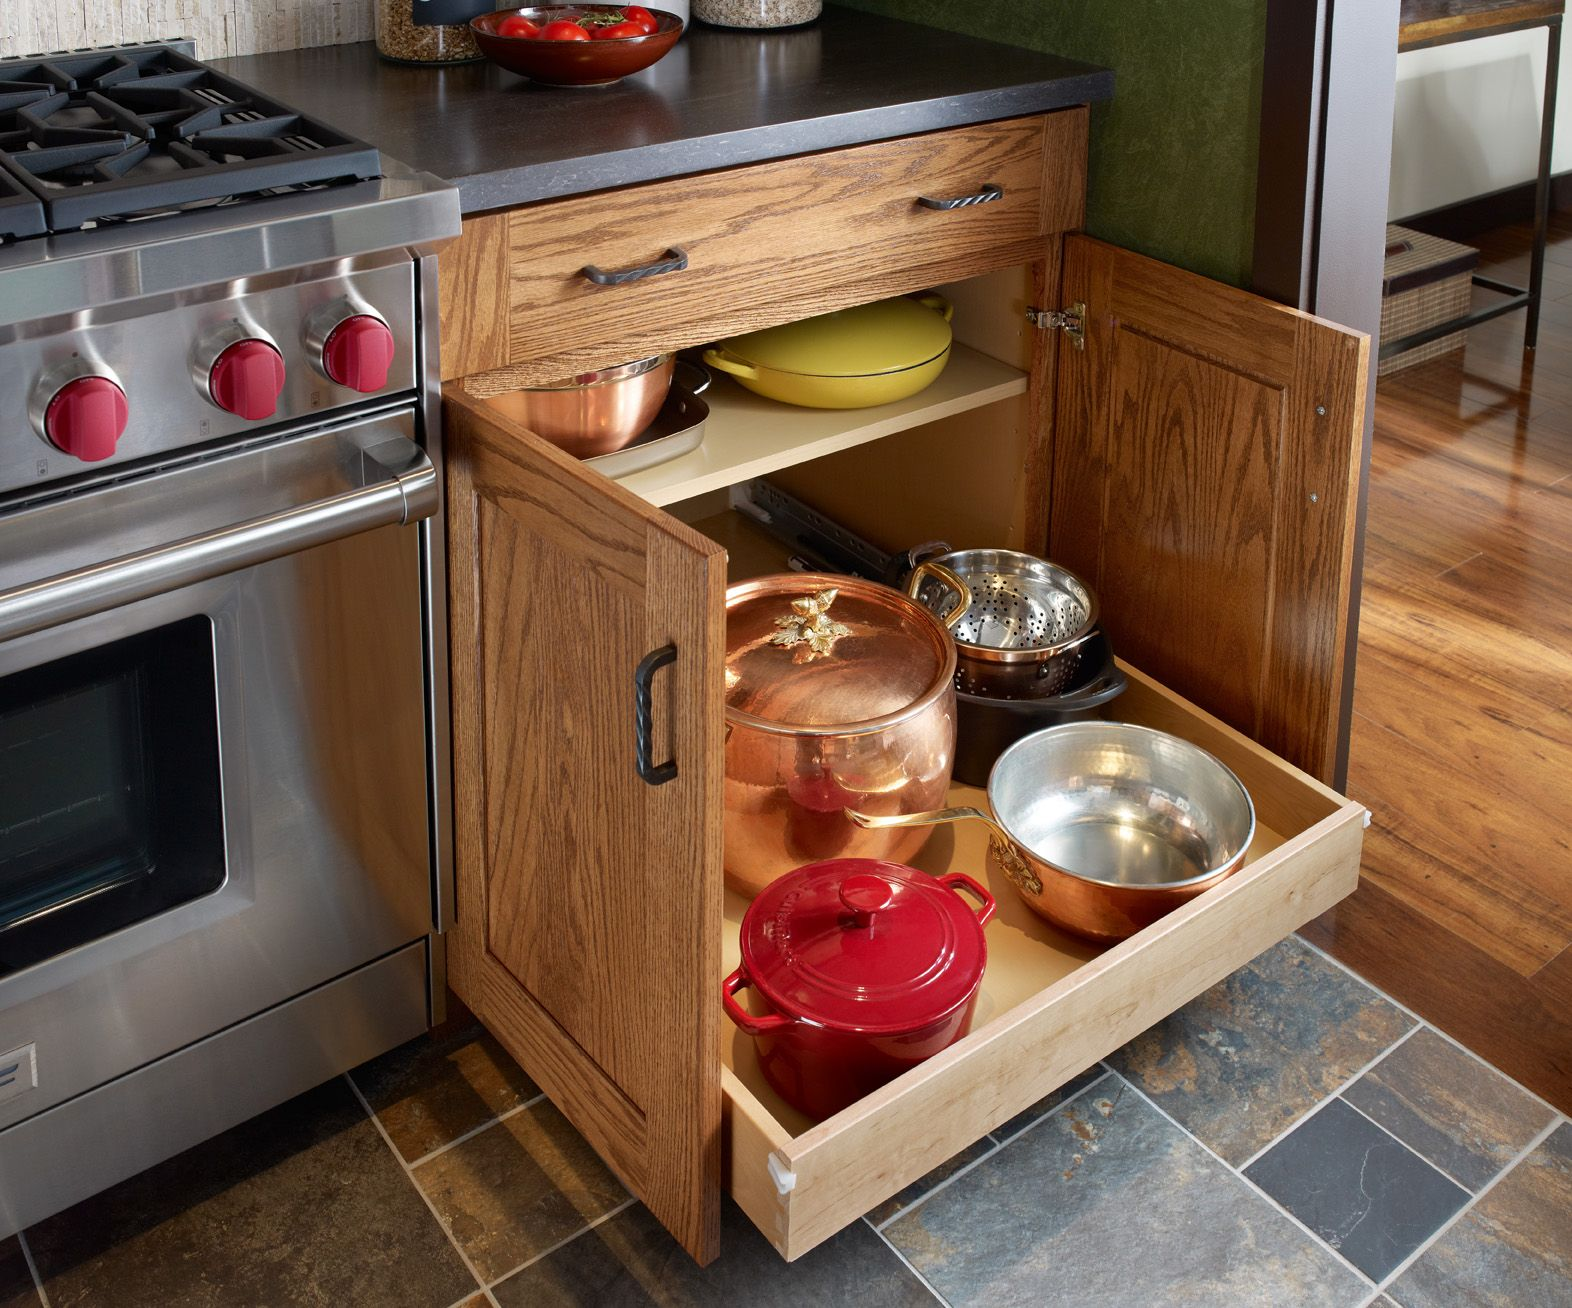 base pot and pan organizer pots and pans kitchen pan organization on kitchen organization pots and pans id=84218